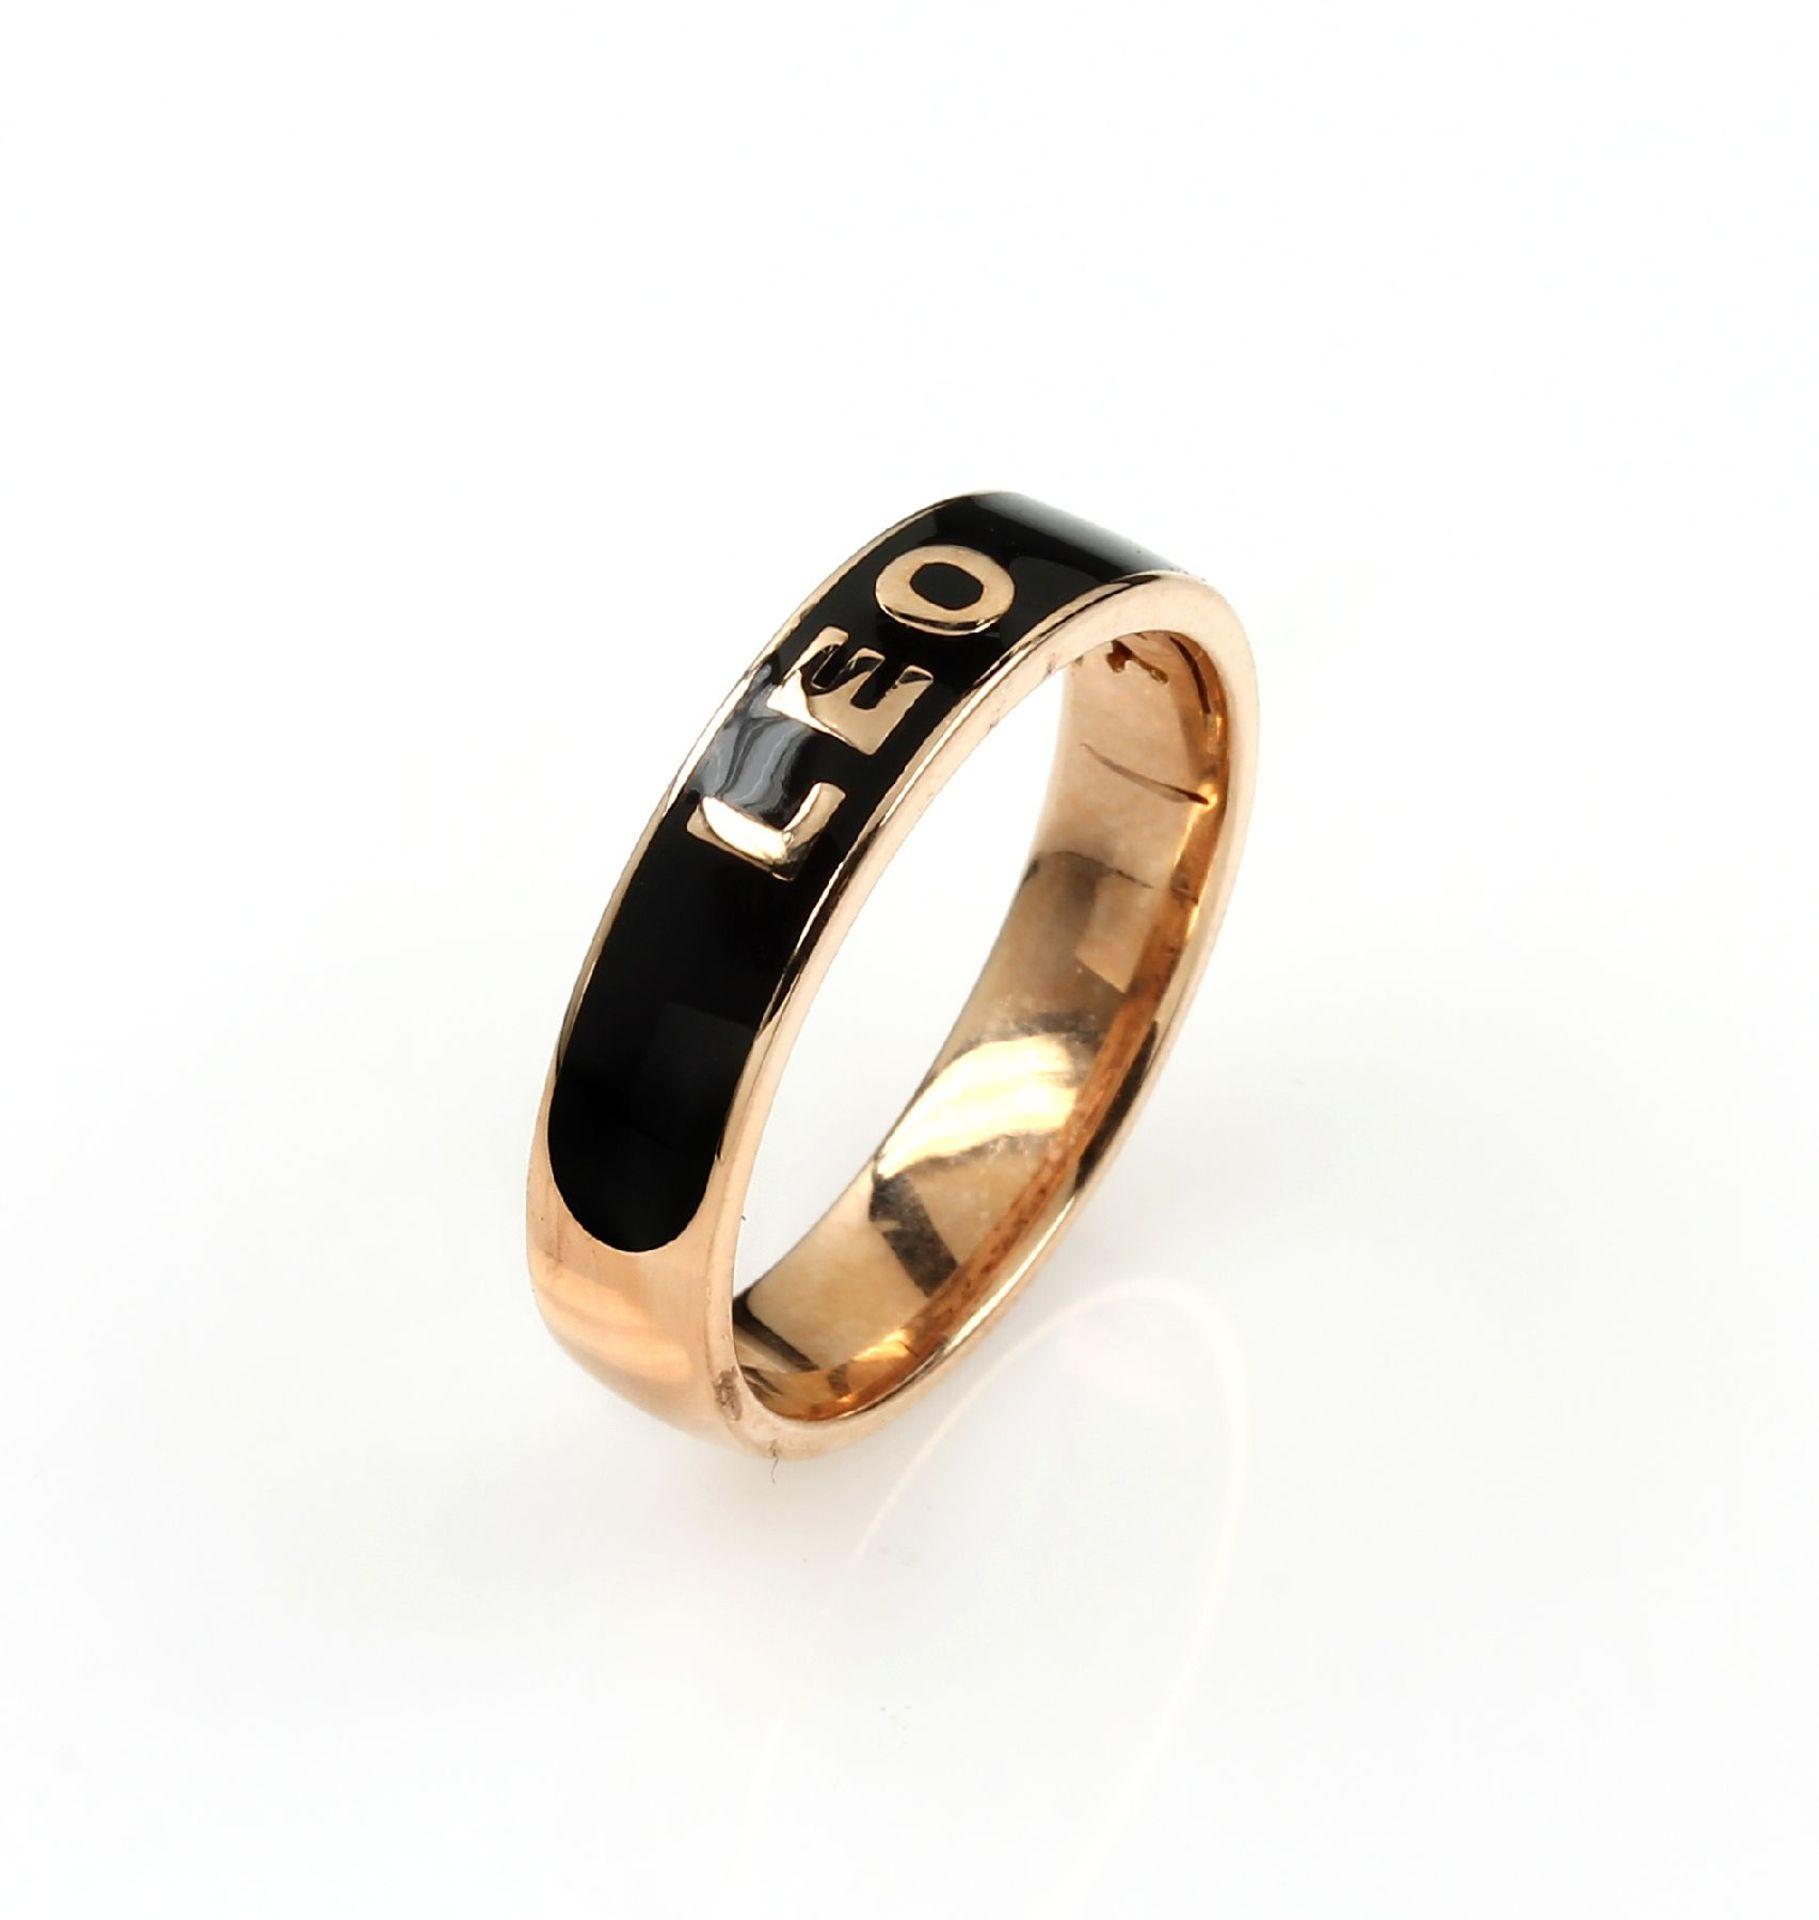 "Los 61552 - 18 kt gold LEO WITTWER ring ""LEO"" with enamel , RoseG 750/000, centered black enameled, with Leo"